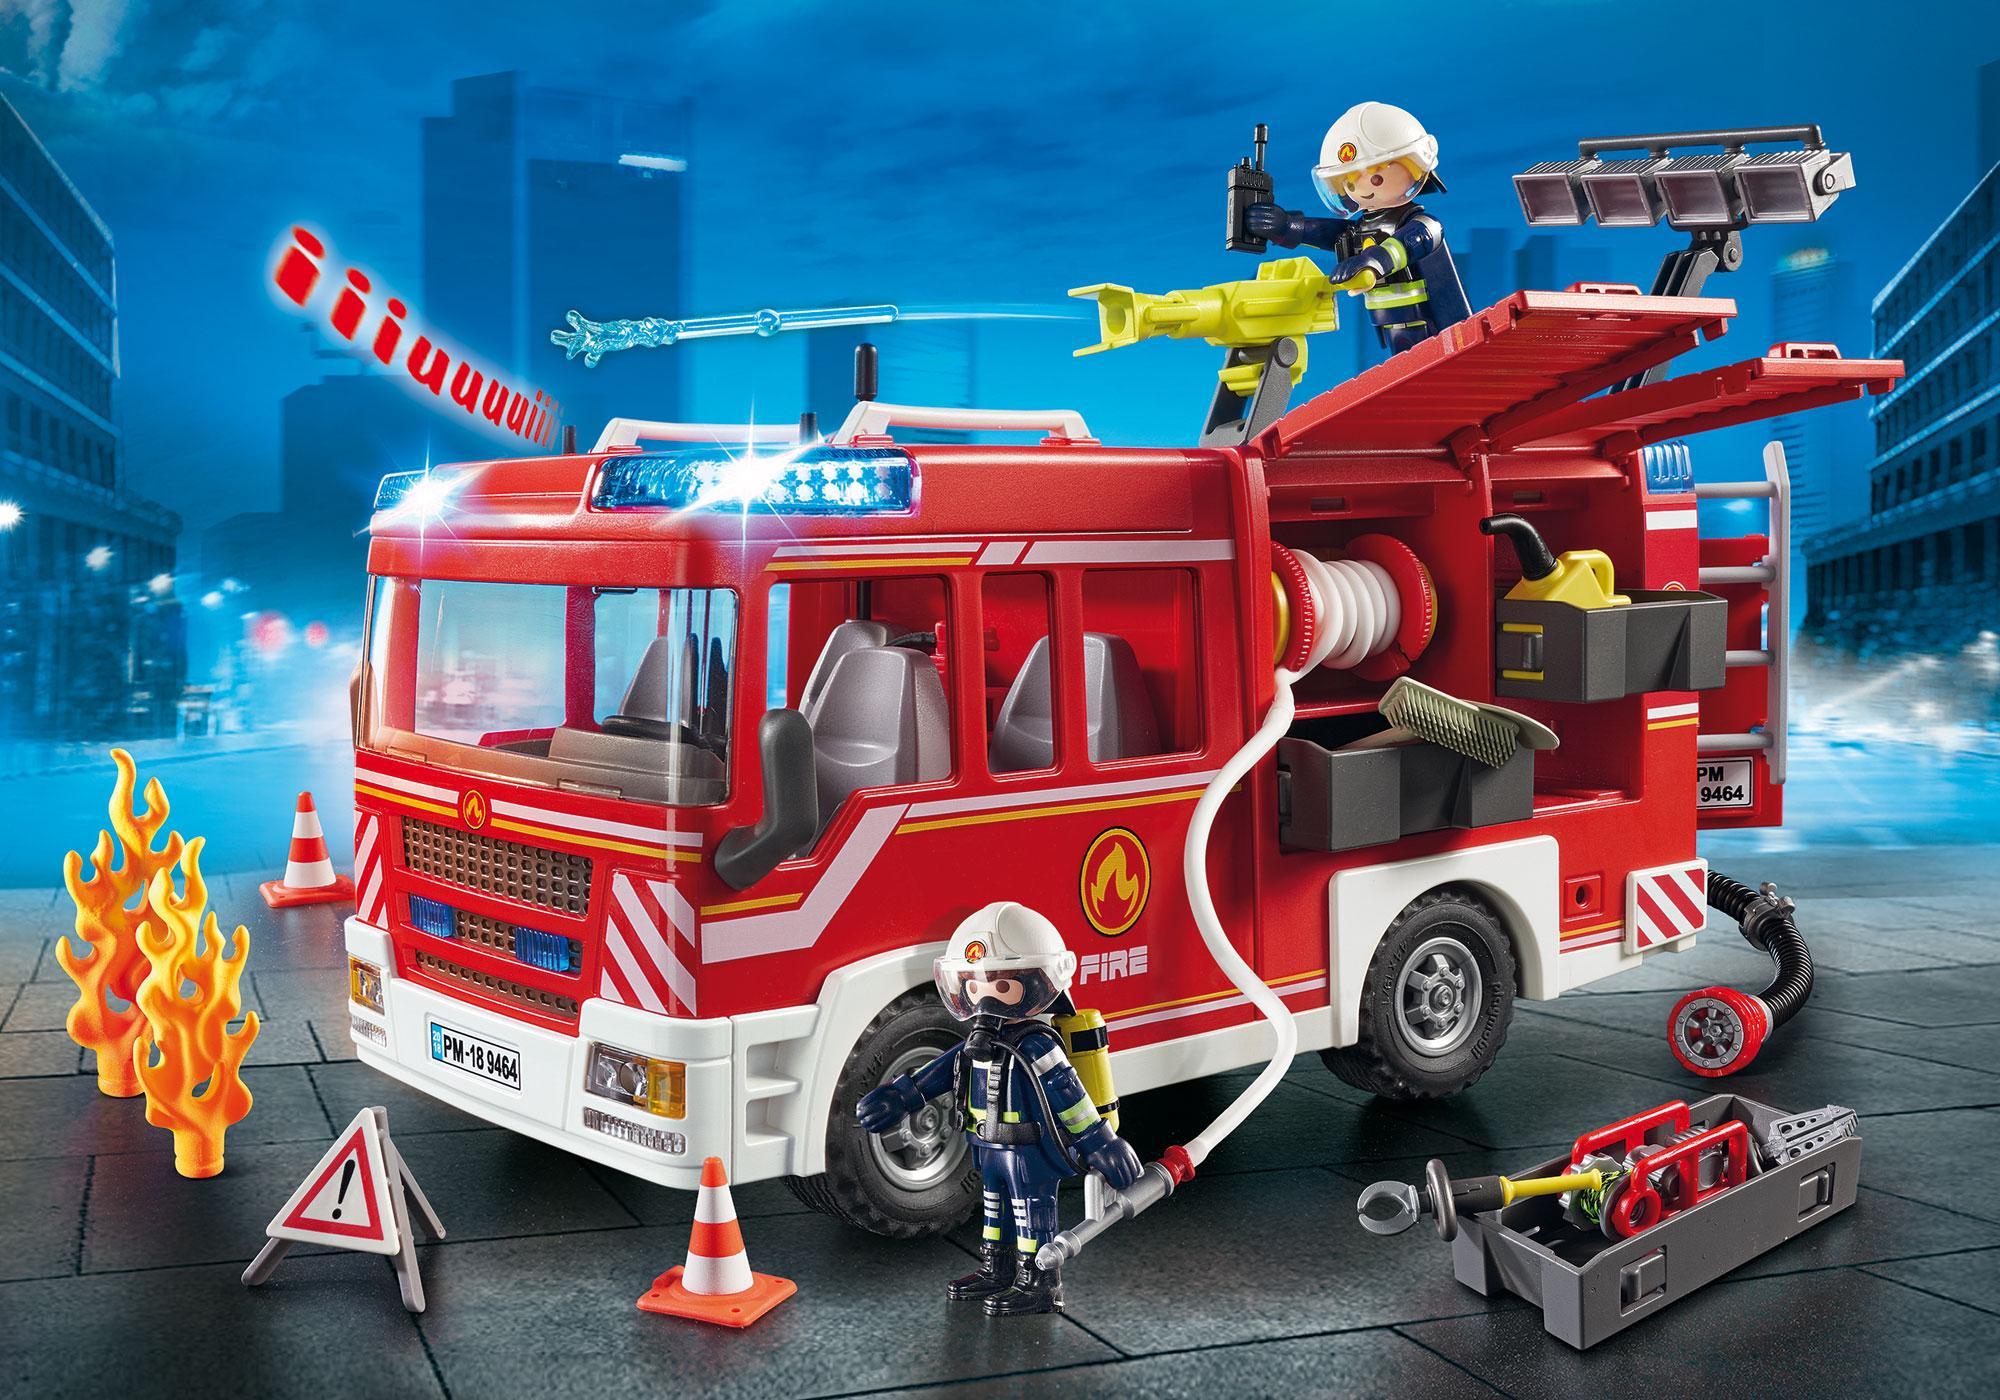 9464_product_detail/Πυροσβεστικό όχημα